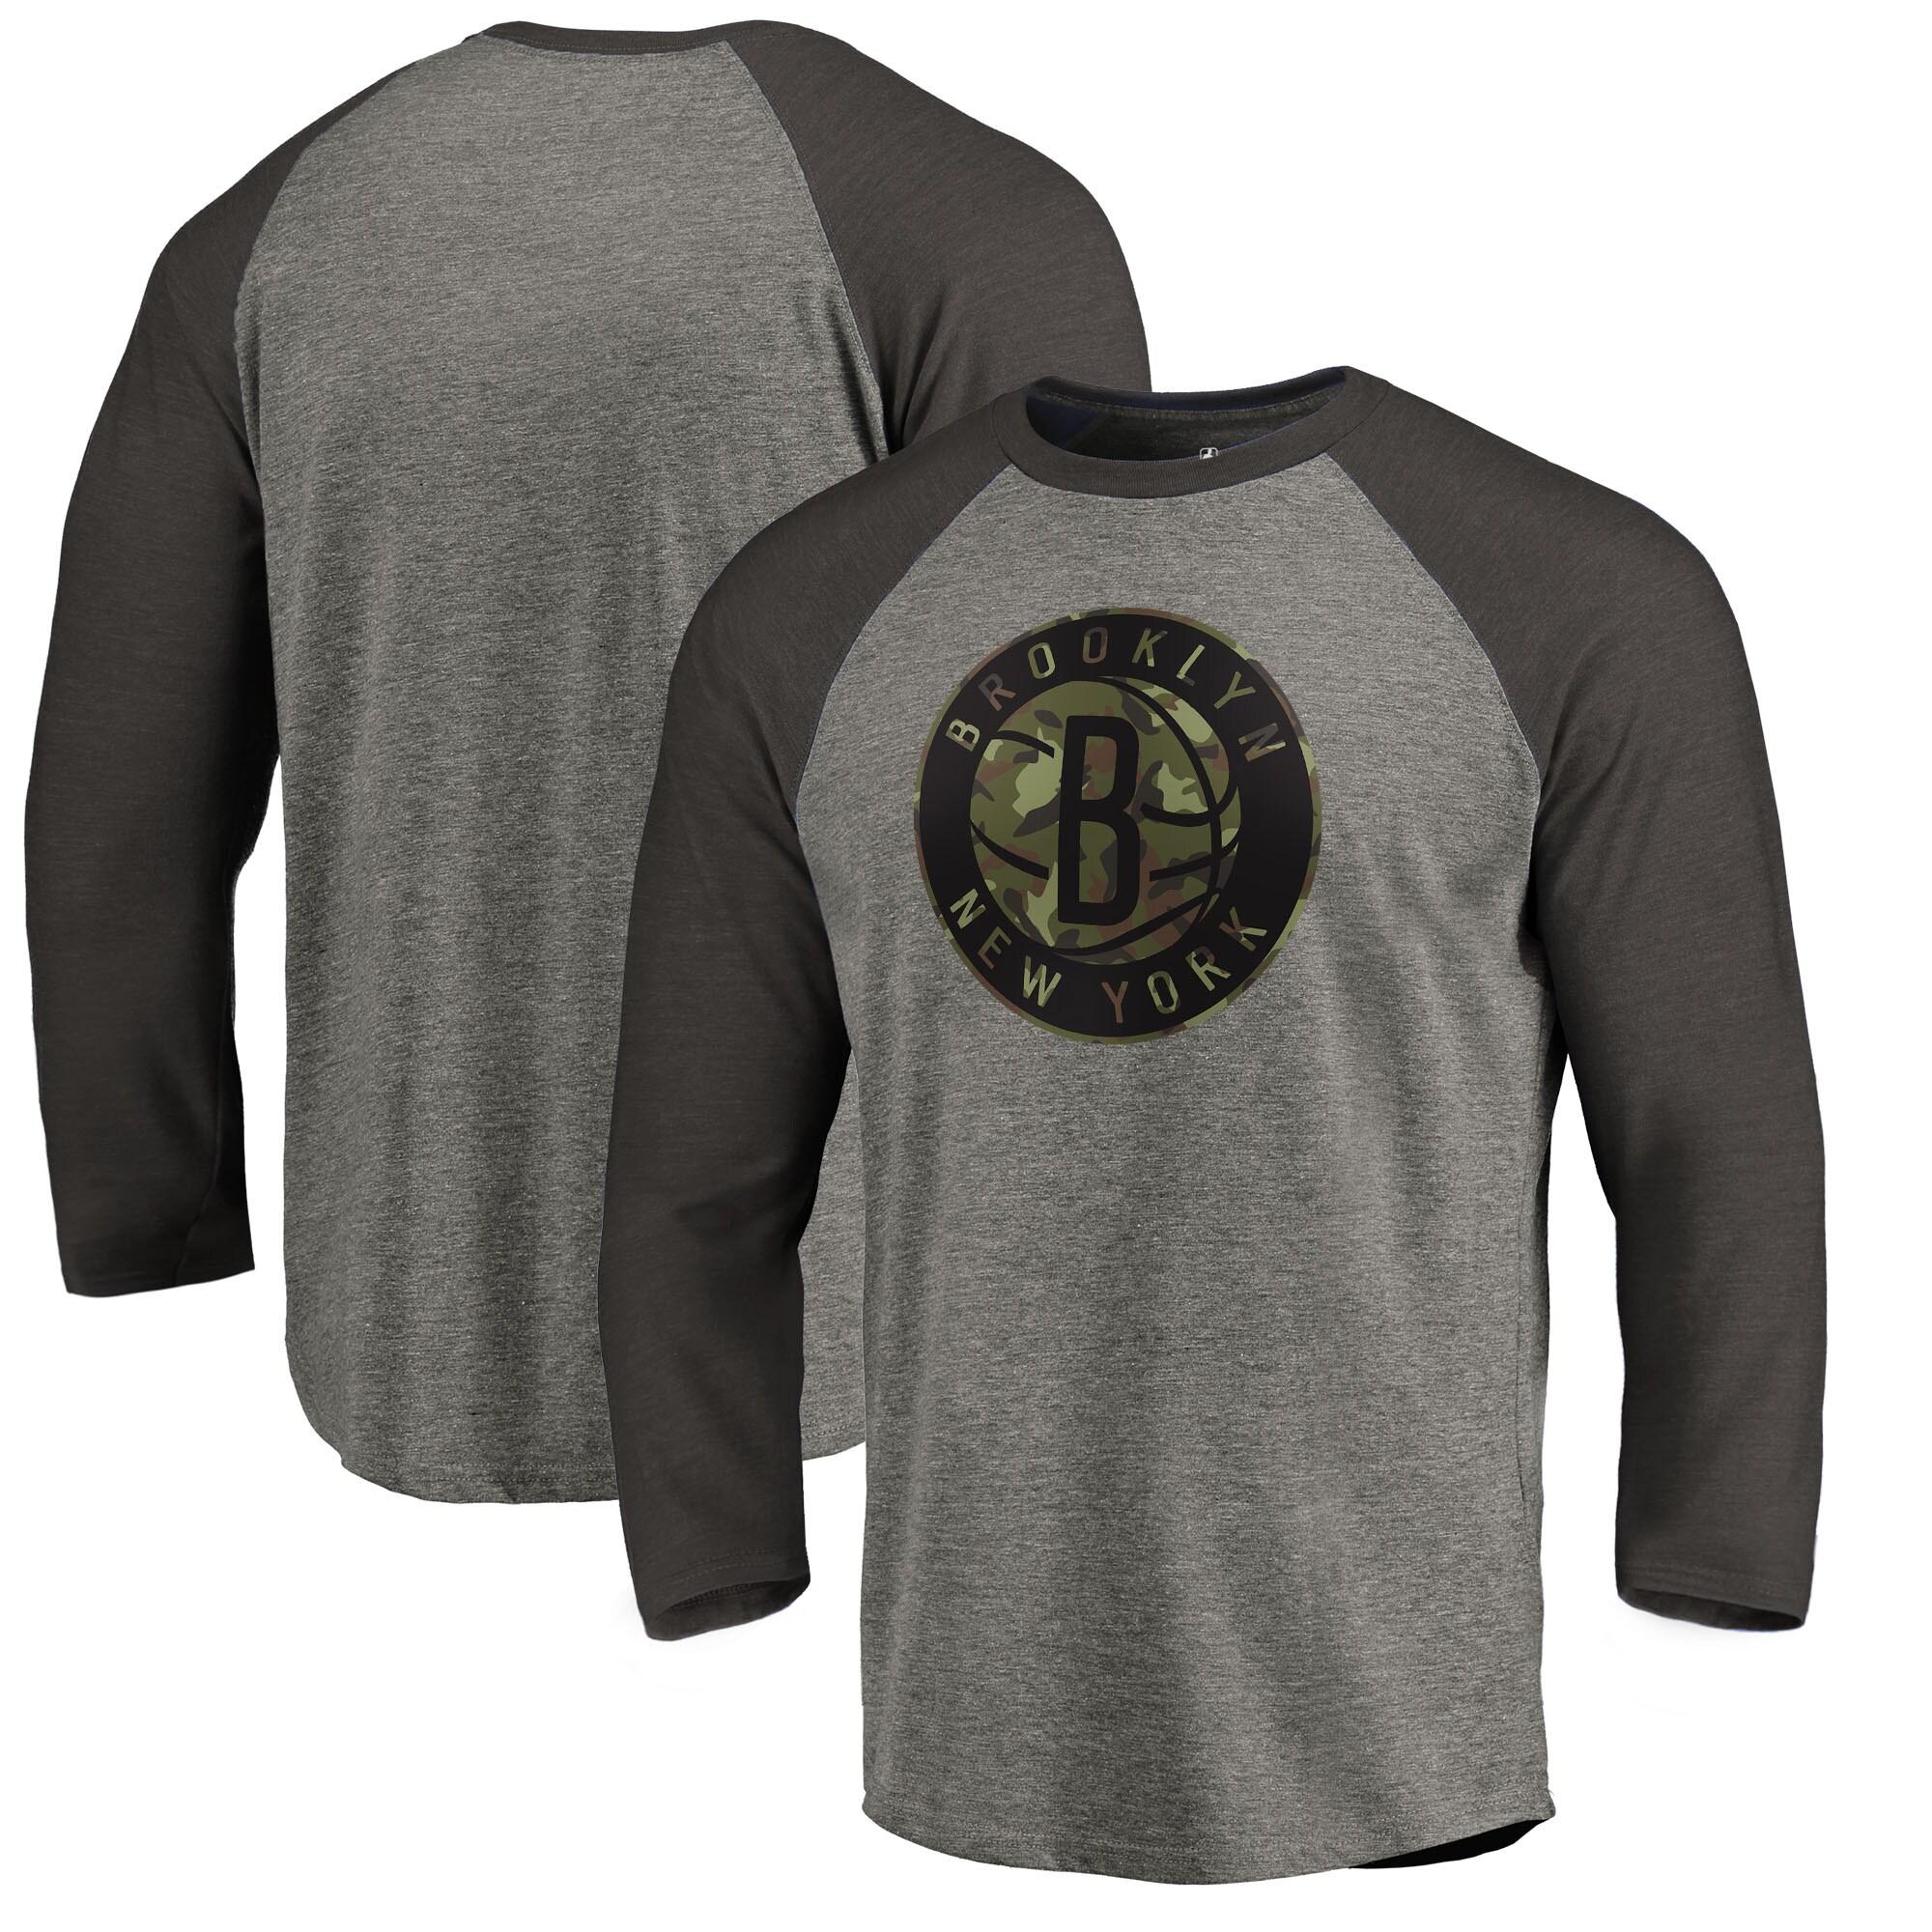 Brooklyn Nets Fanatics Branded Camo Collection Prestige 3/4-Sleeve Raglan T-Shirt - Heathered Gray